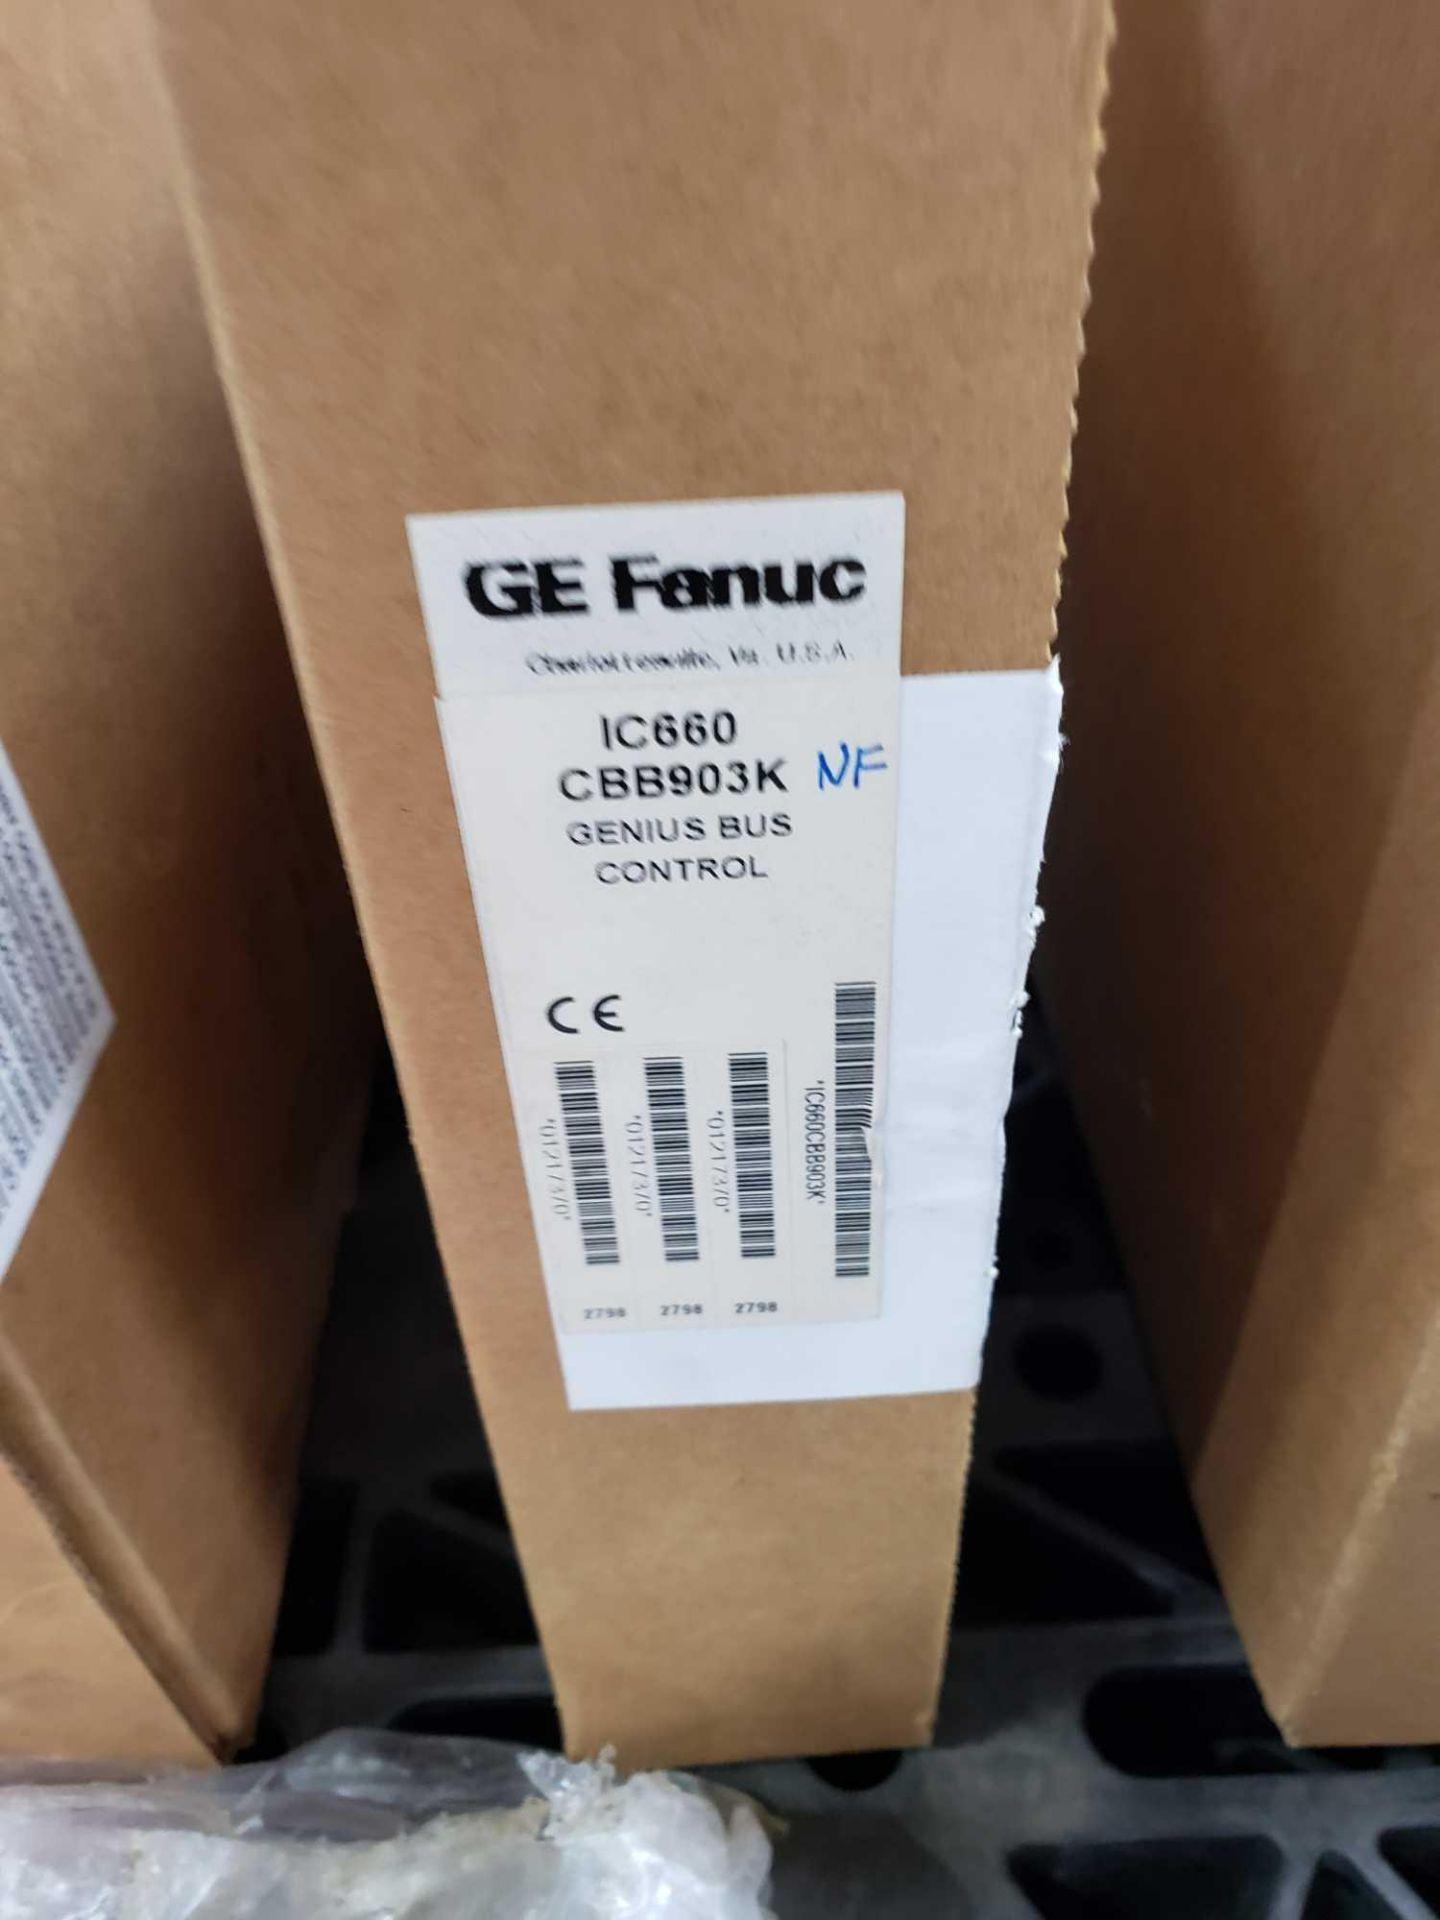 Lot 361 - GE Fanuc model IC660CBB903K genius bus control. New in open box.